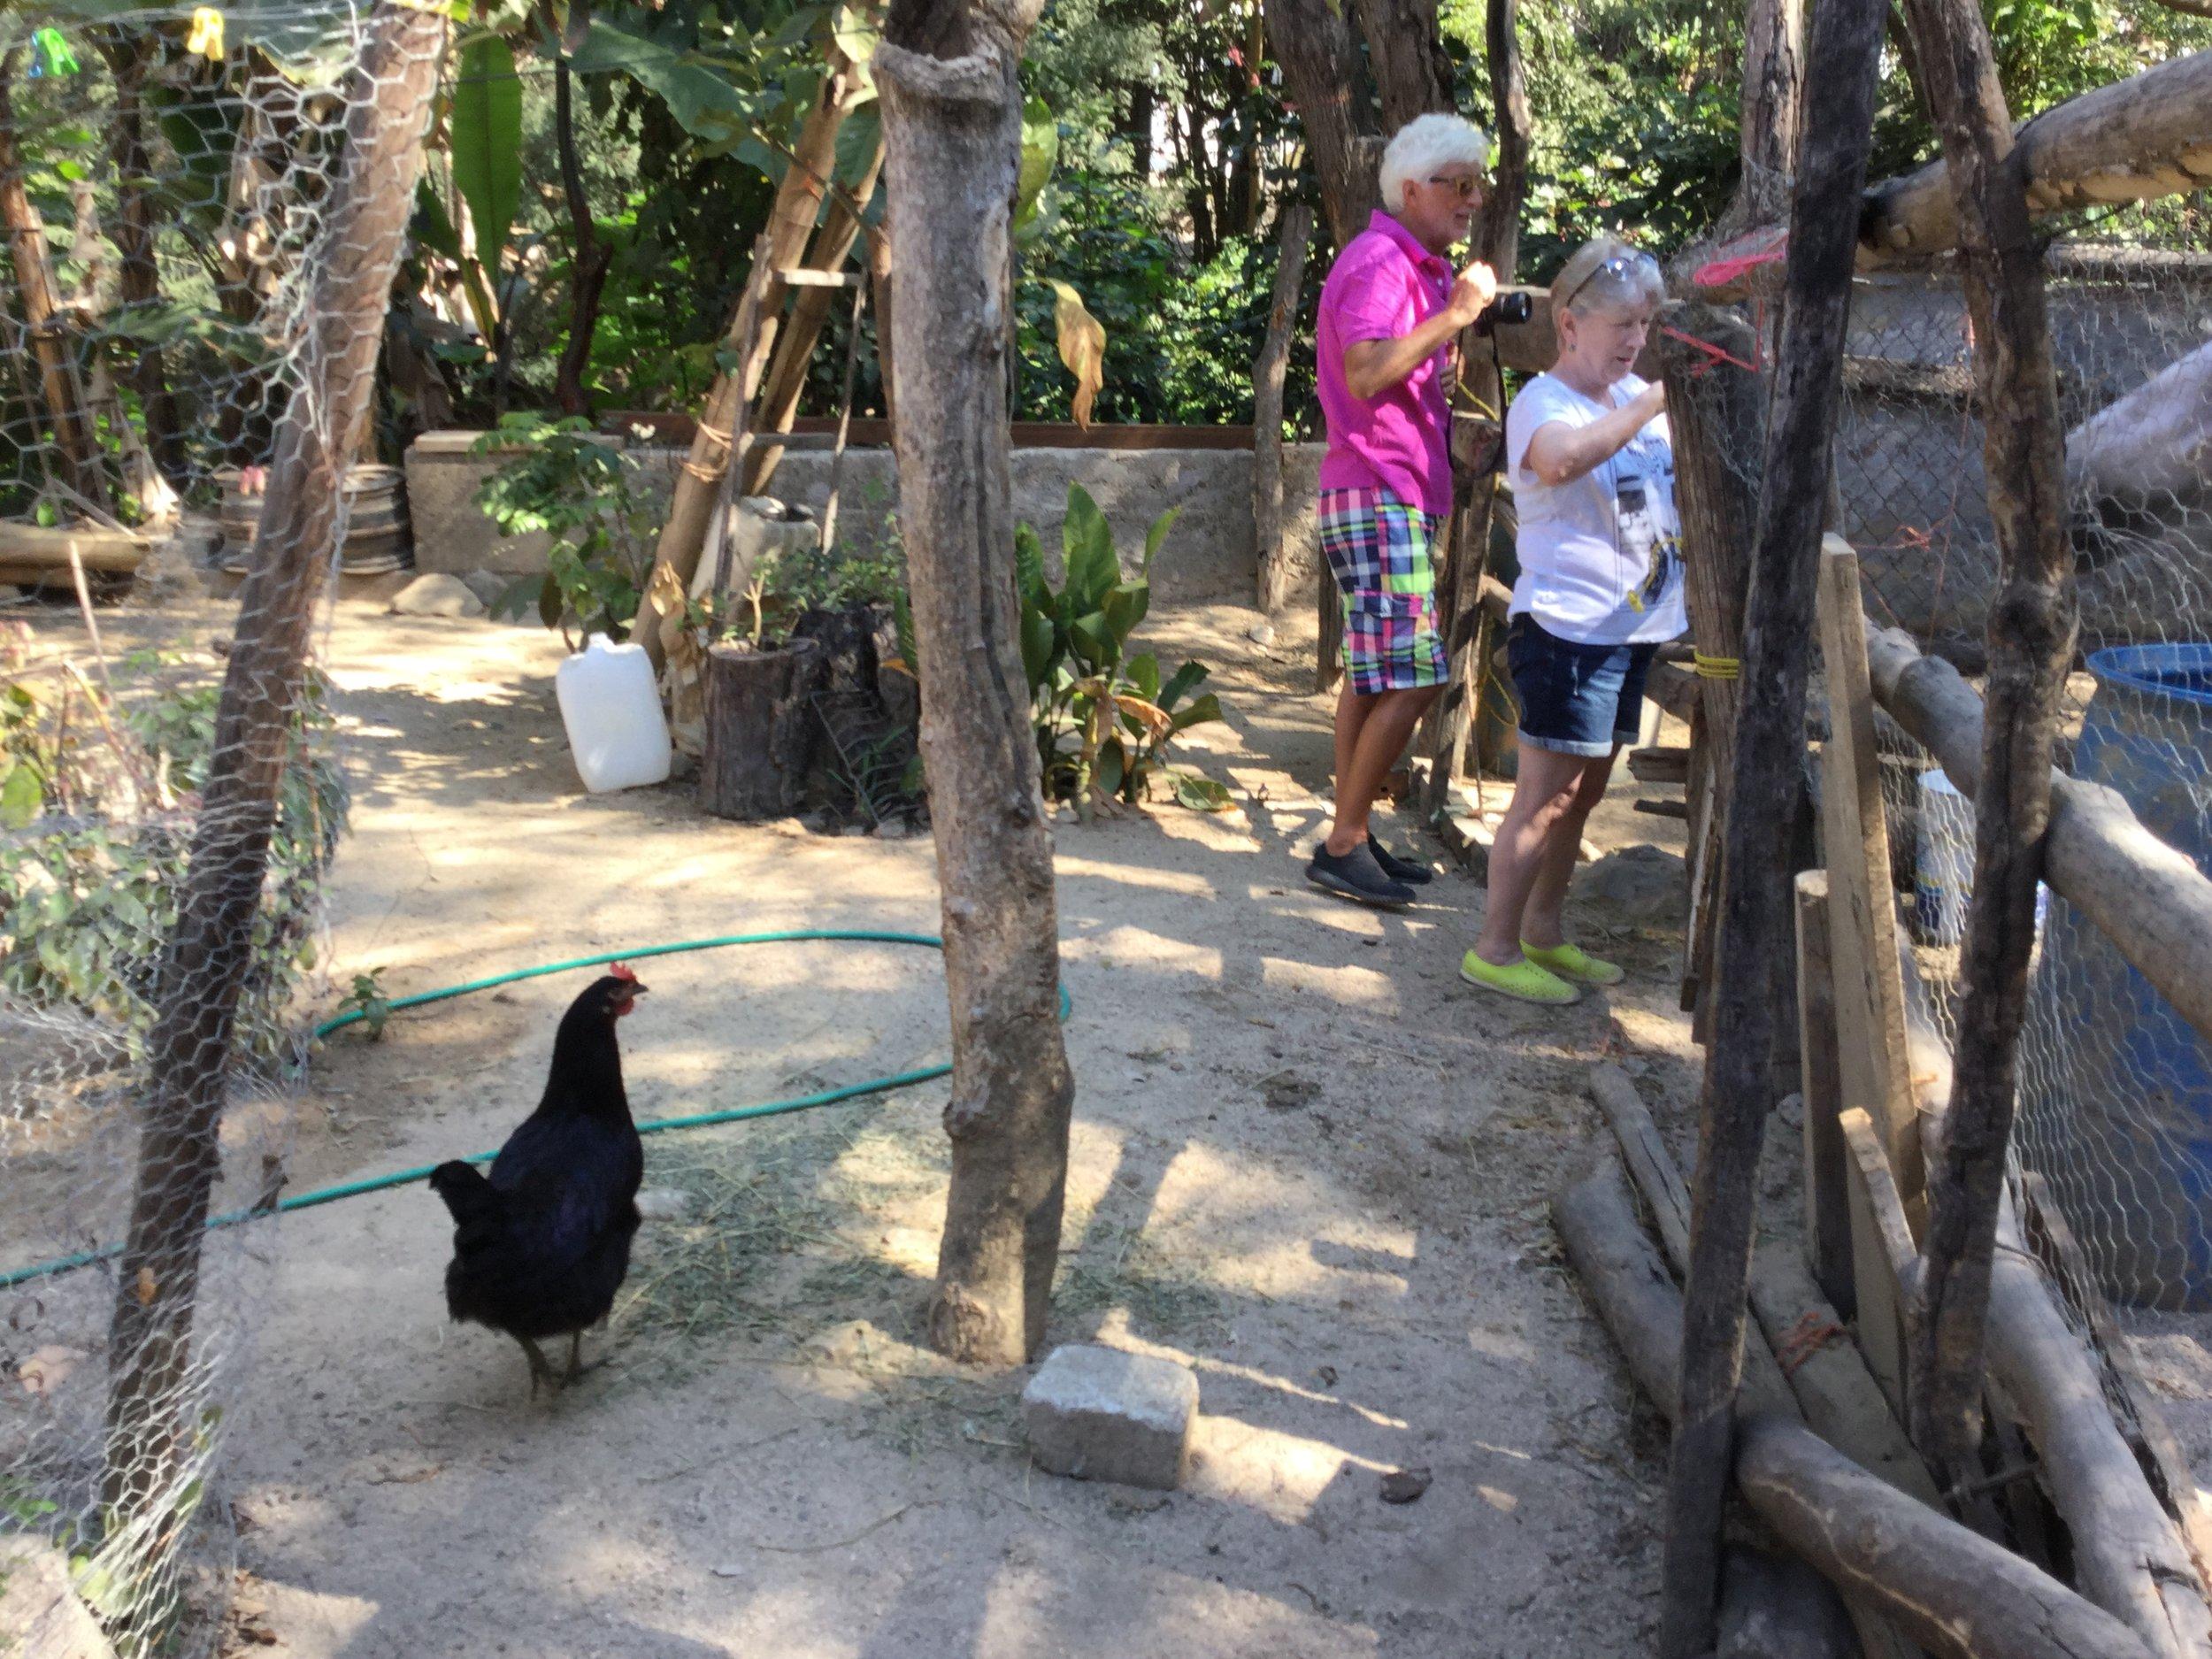 Dante, Linda and the black hen also had a visitation.